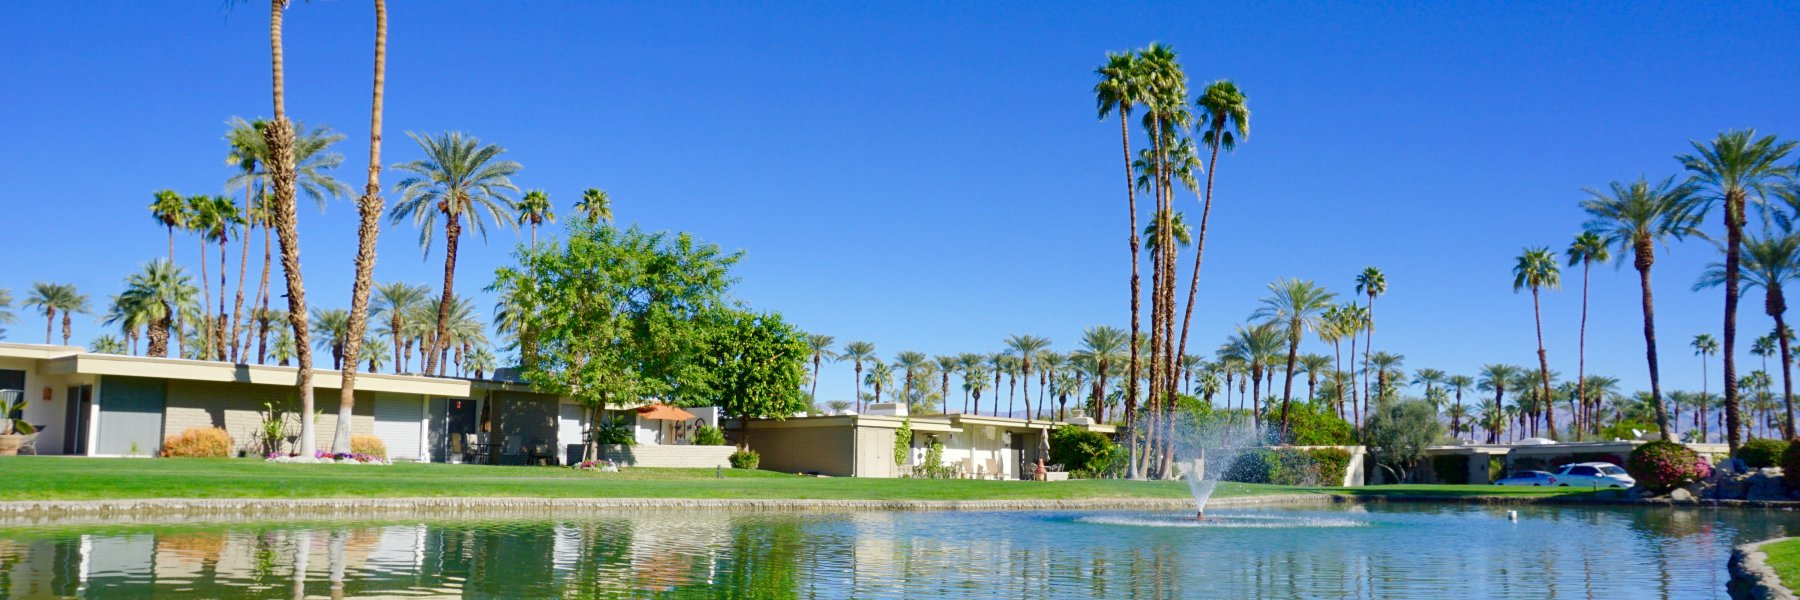 Casa Dorado is a community of homes in Indian Wells, California